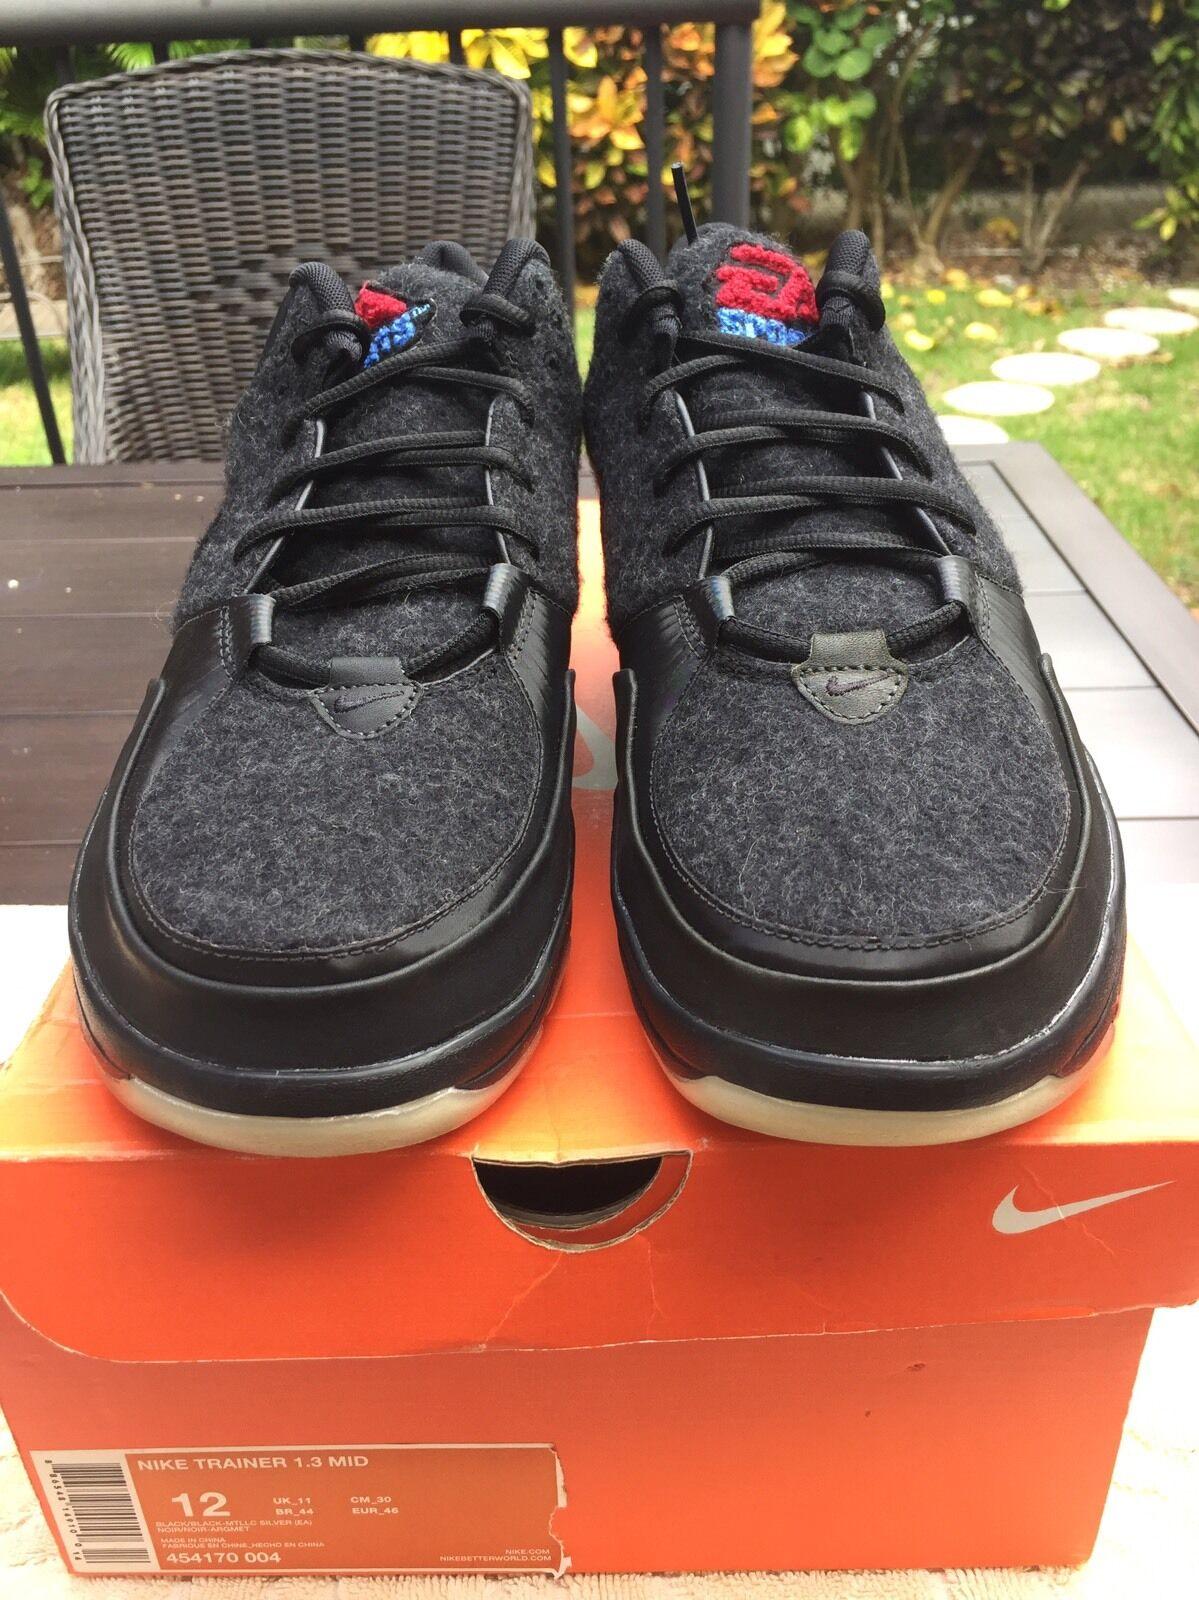 Nike Trainer 1.3 Mid EA Sports Wool Black  Letterman 454170 004 Sz 12